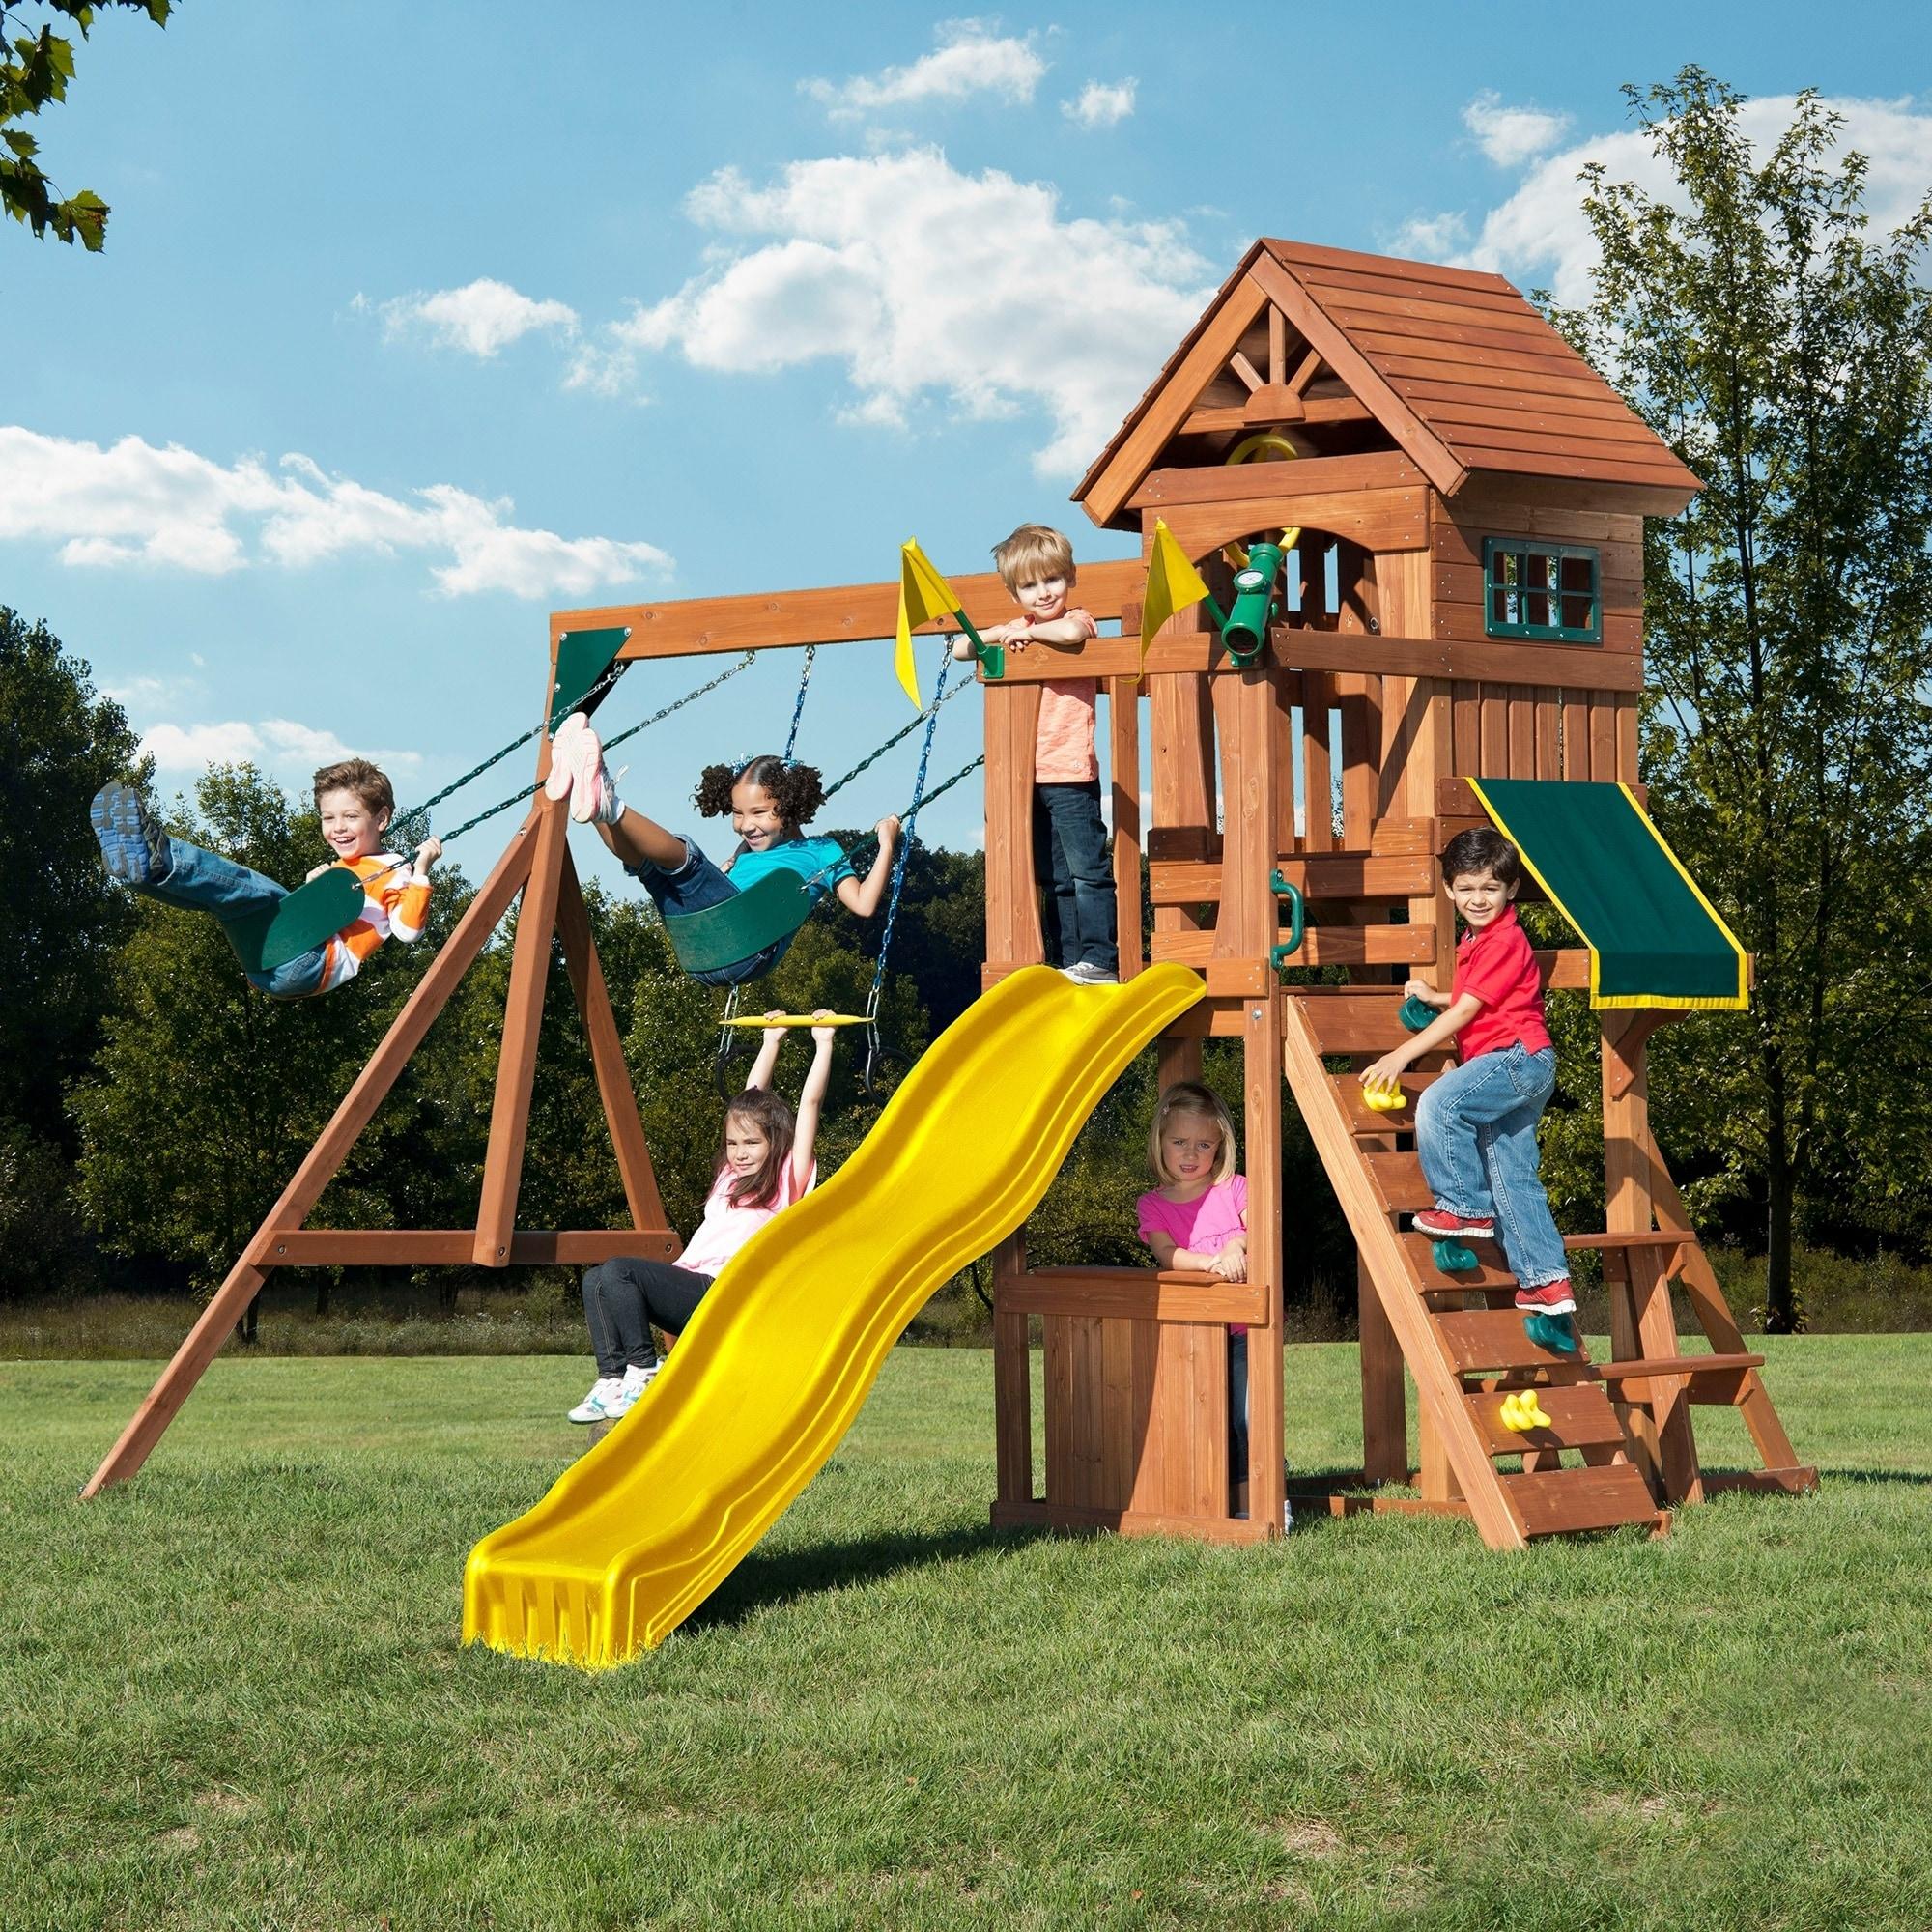 Shop Swing N Slide Jamboree Fort Wooden Swing Set With Rock Climbing